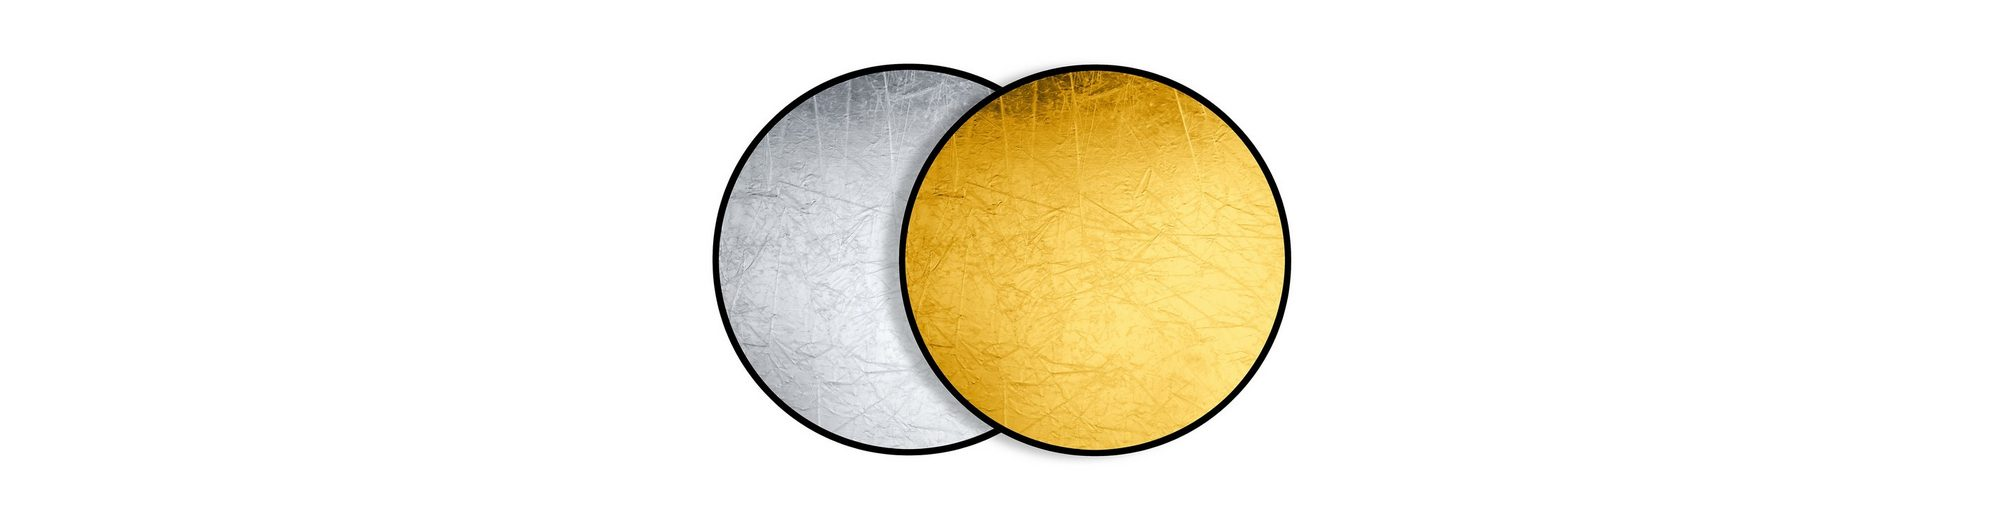 Bresser Fotostudio »BRESSER BR-TR5 Faltreflektor gold/silber 110cm run«